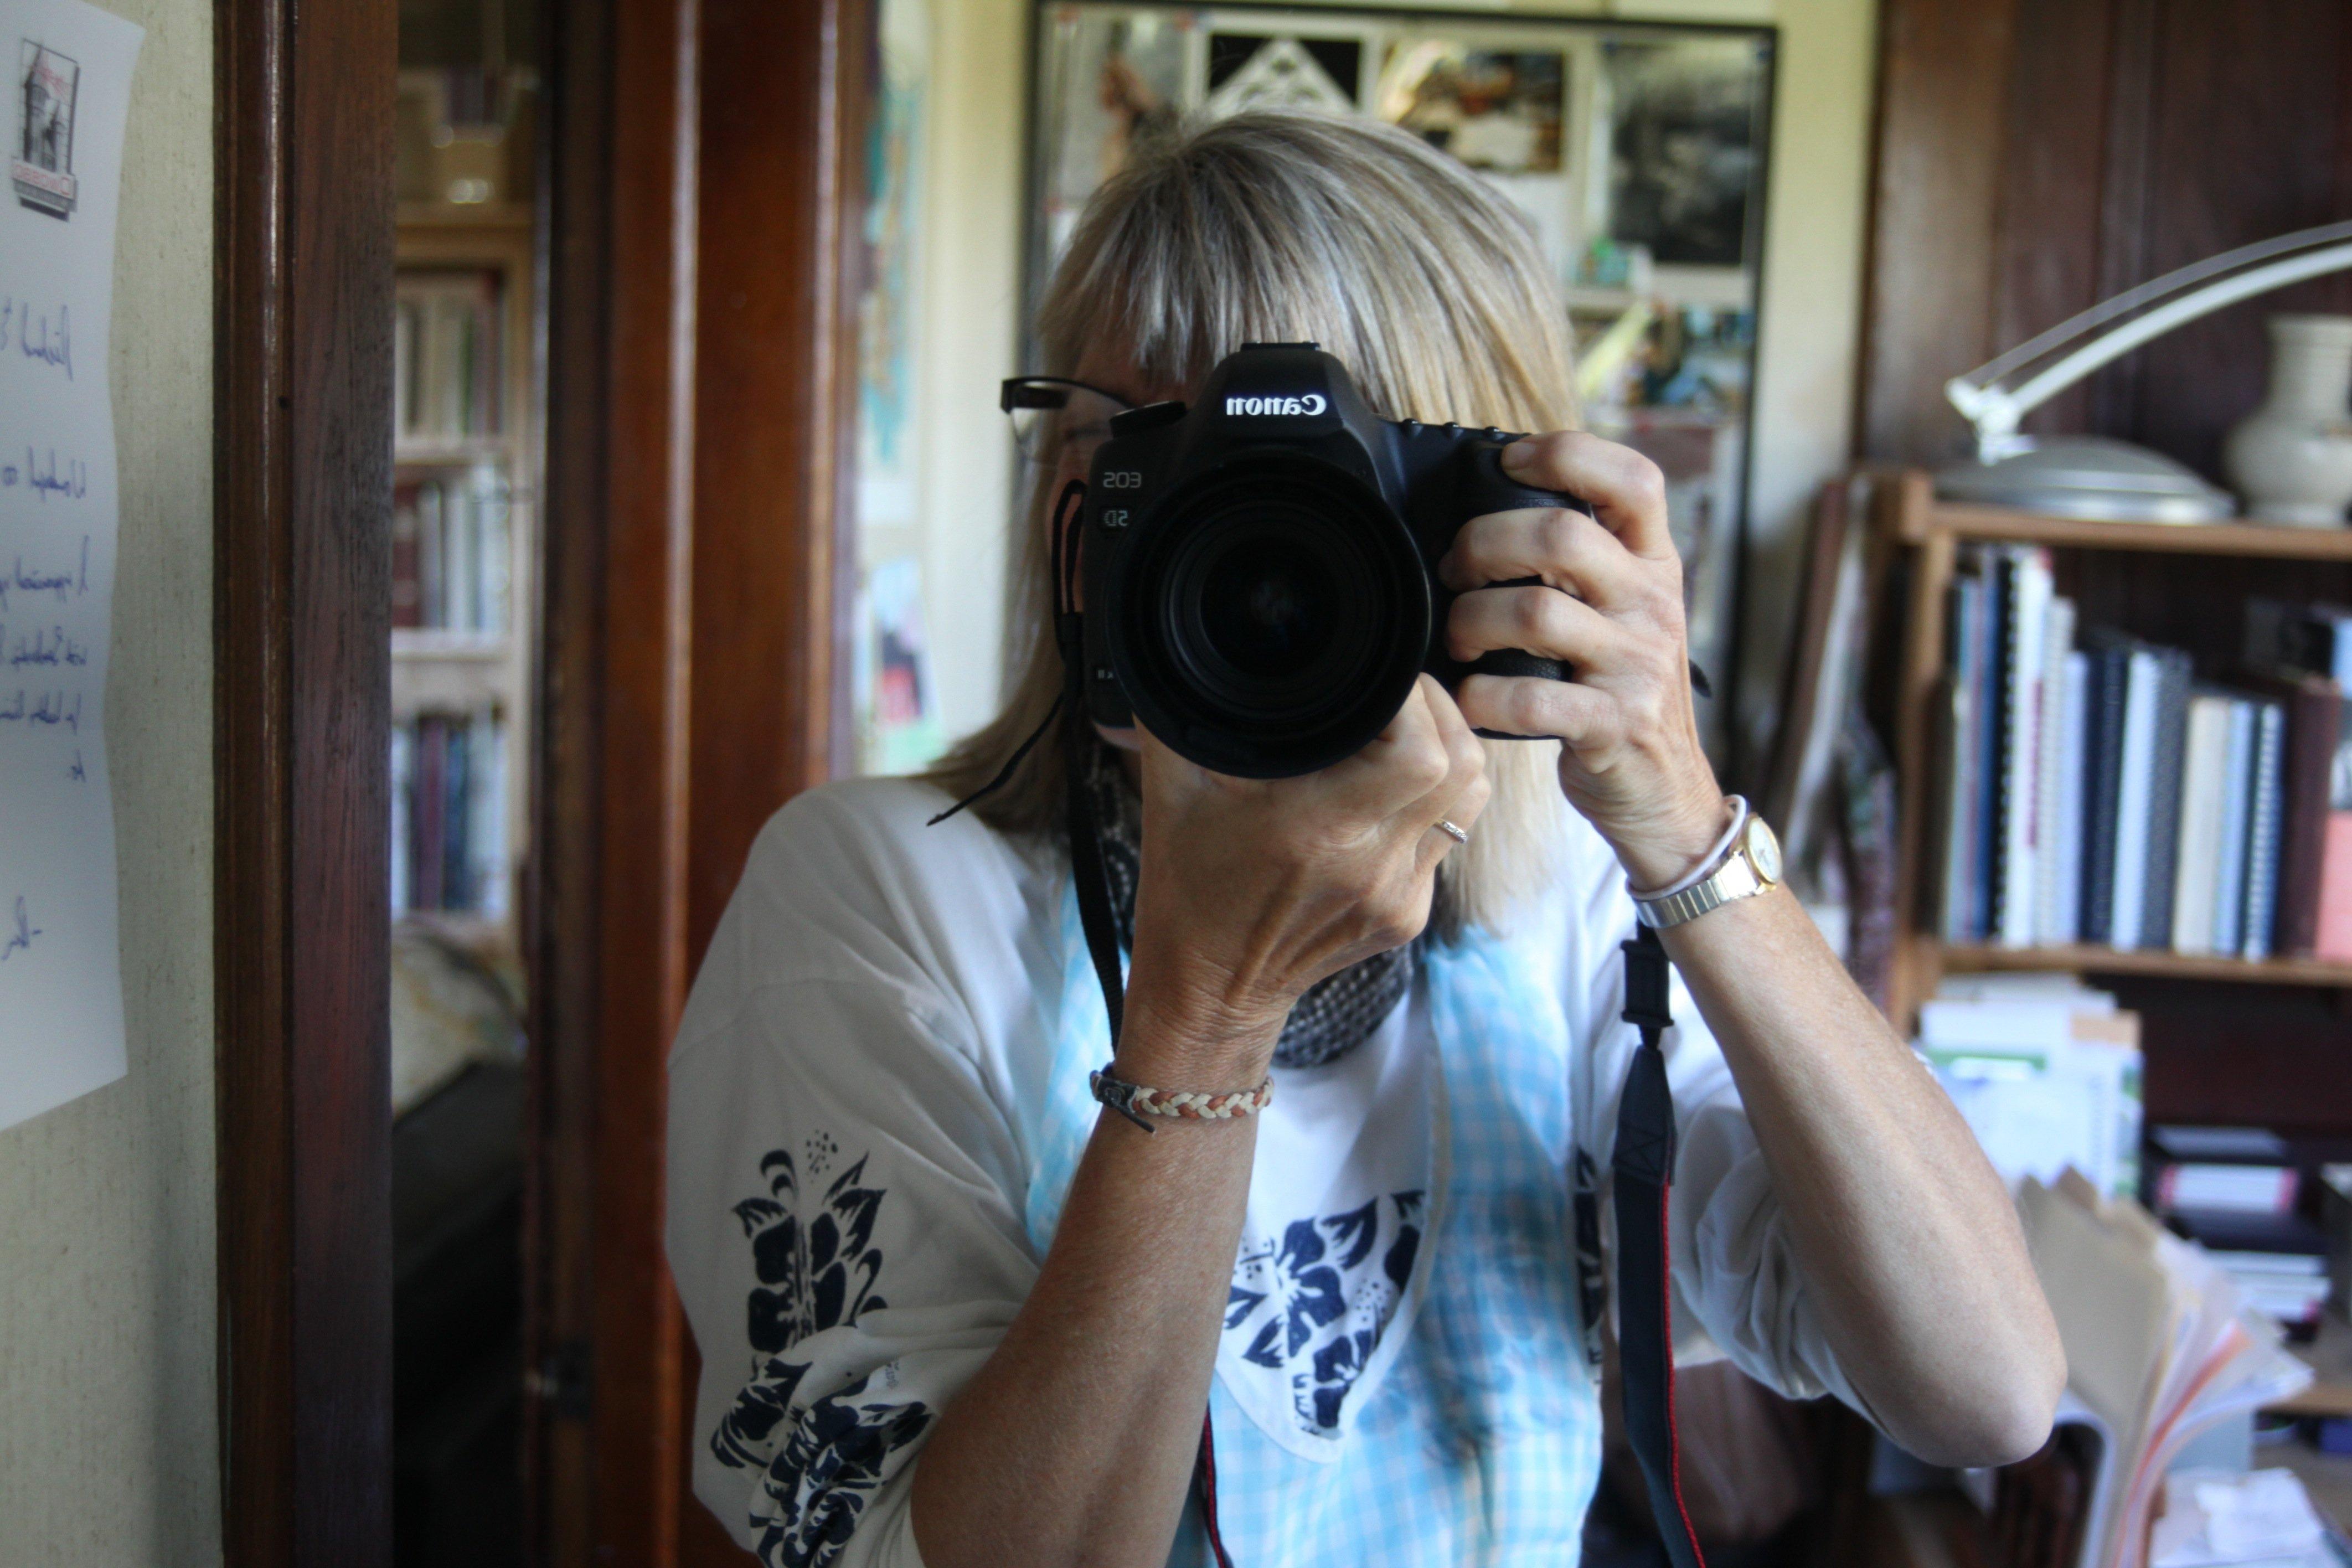 pooh w: camera